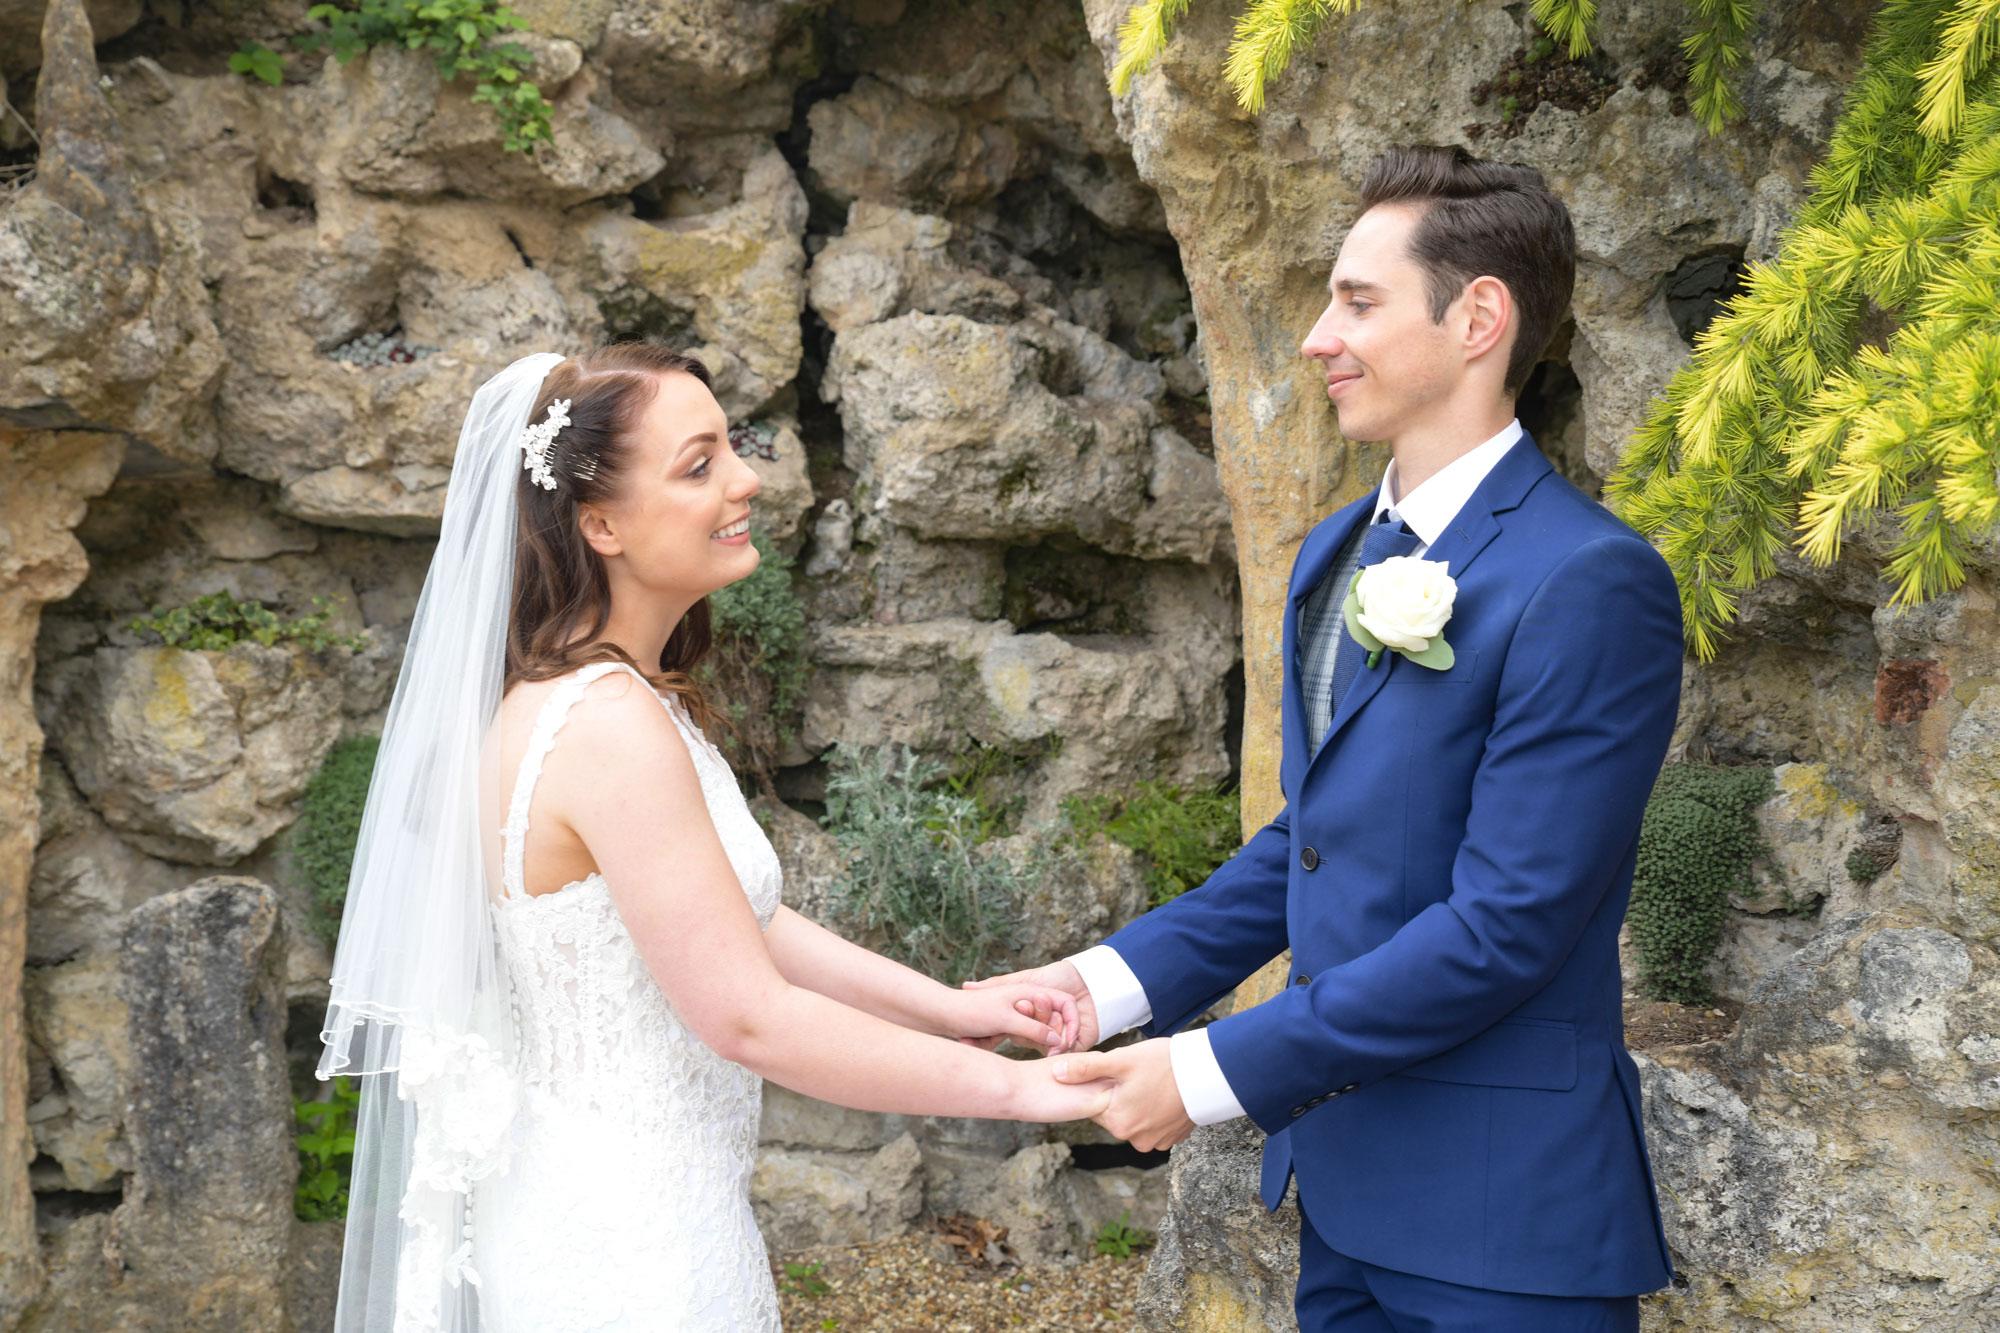 Wotton House Wedding Photographer Ideas by the Cave